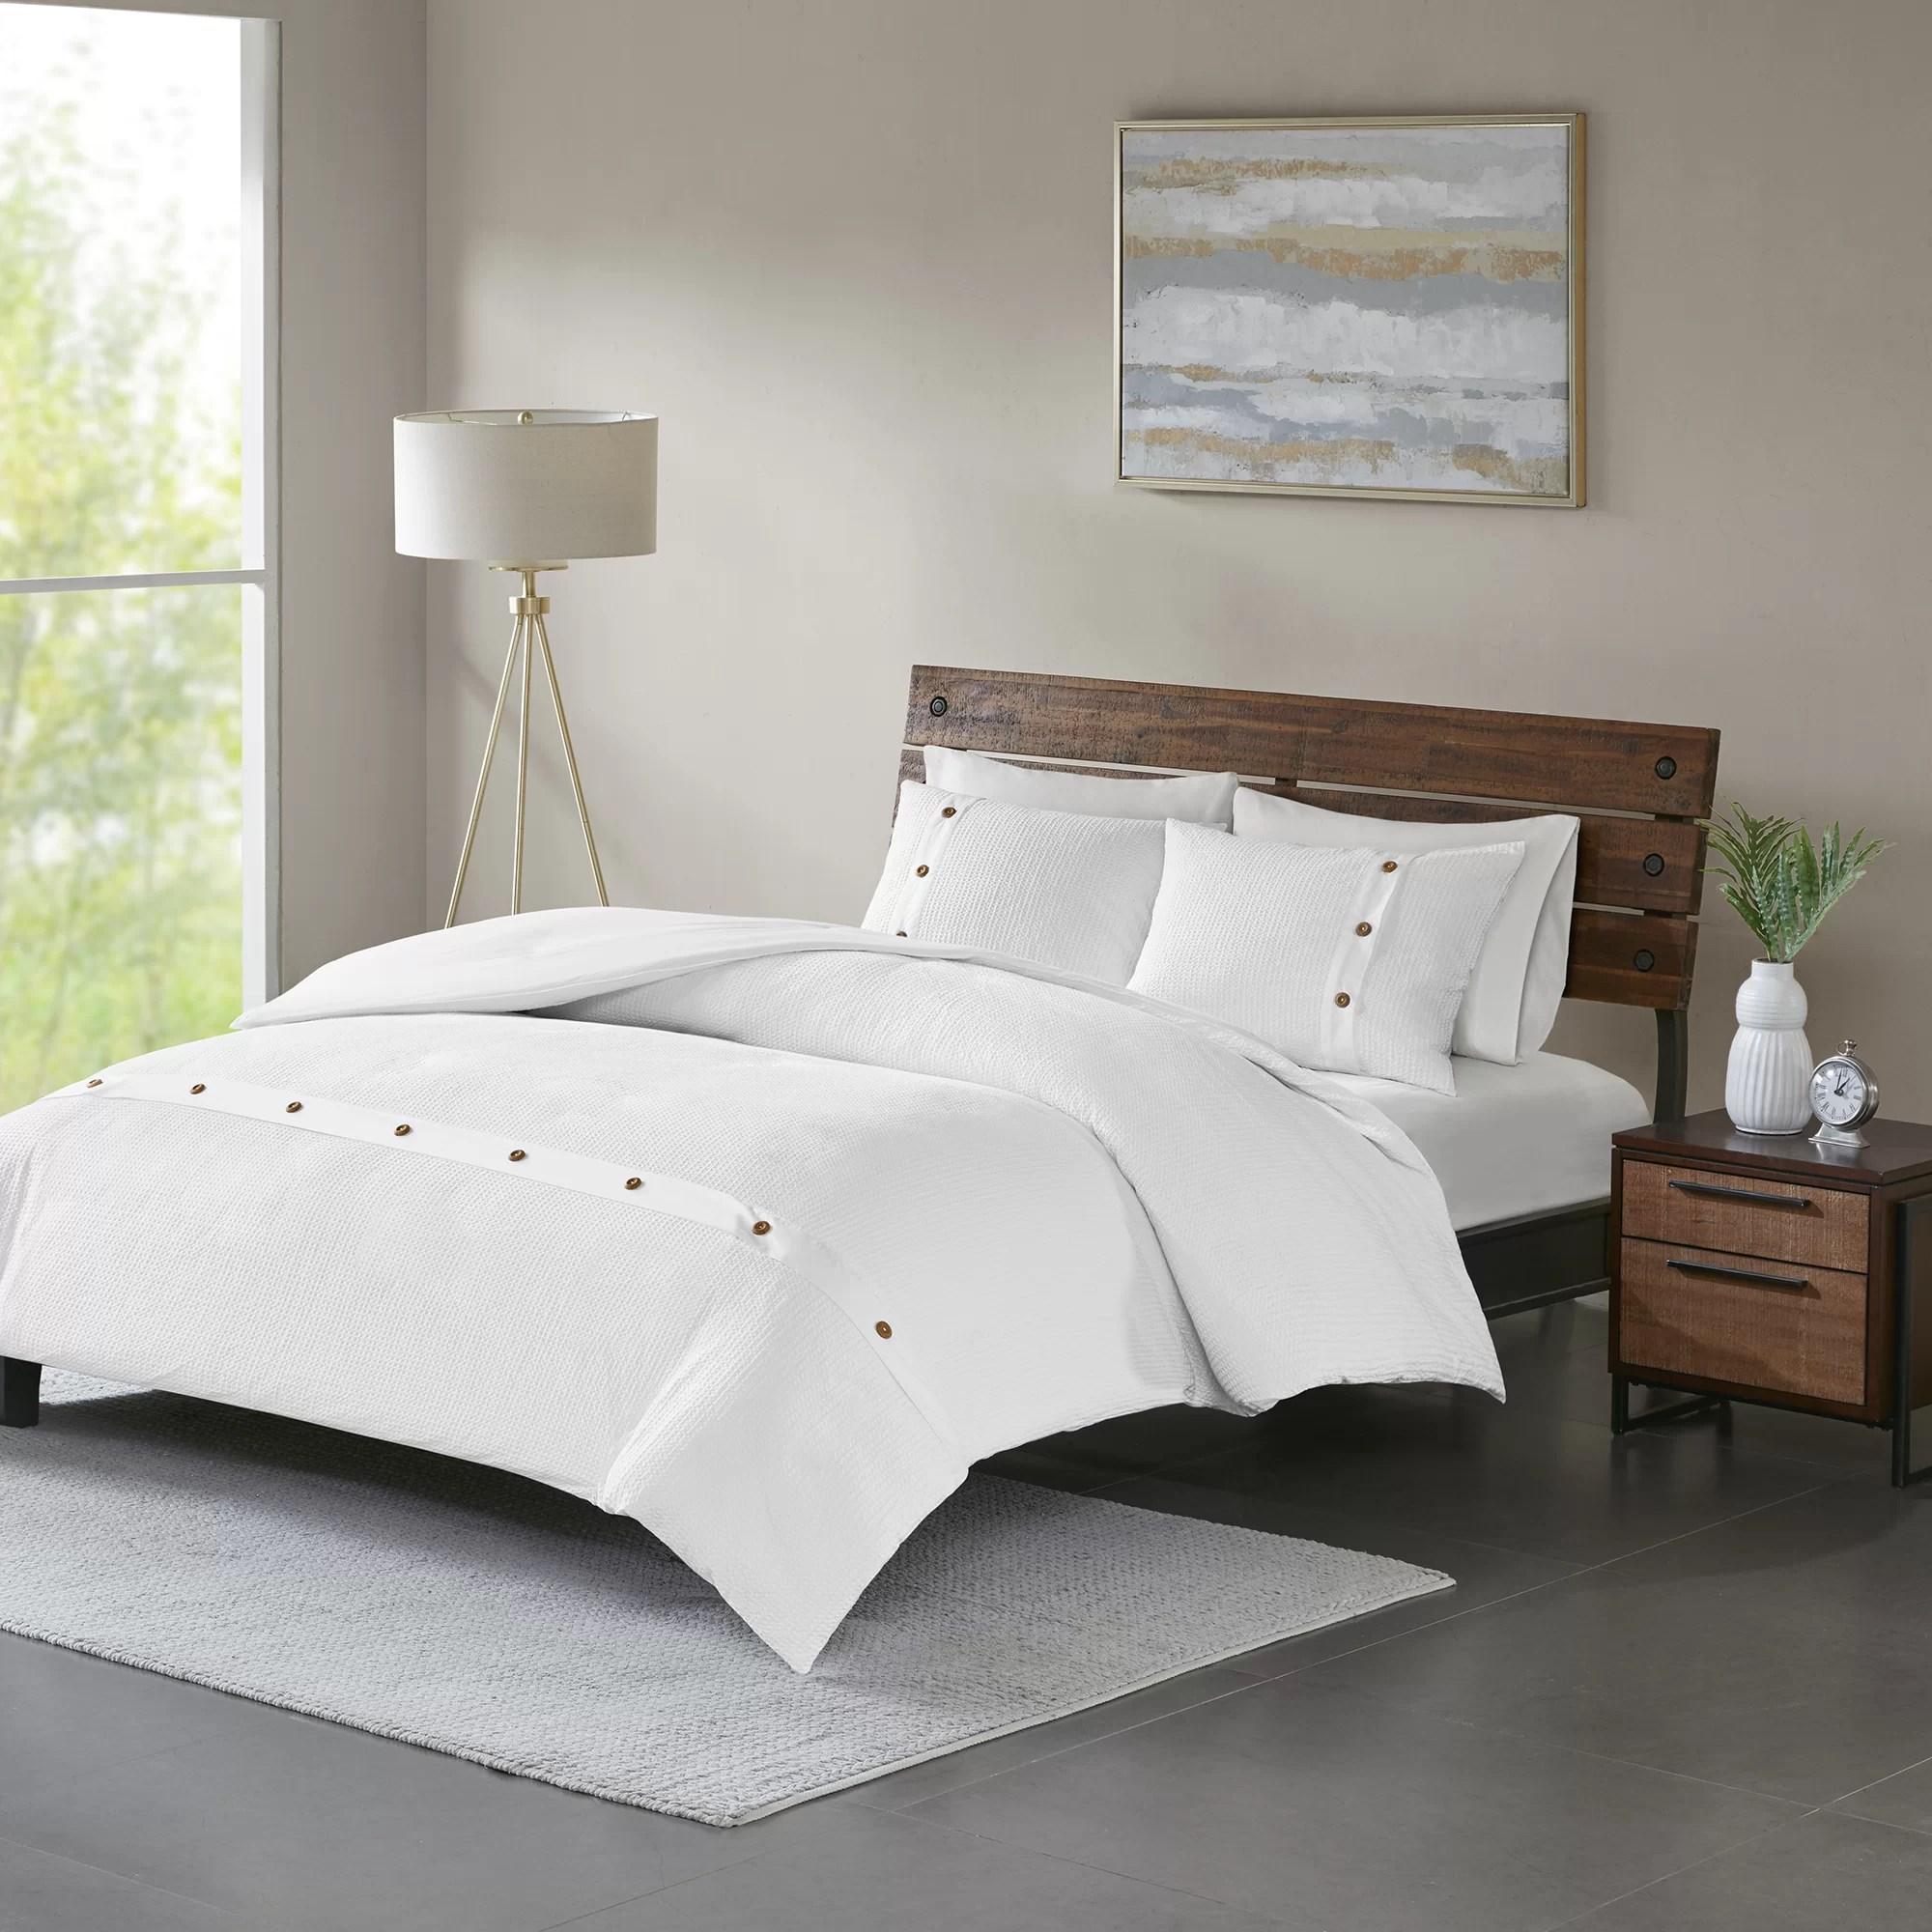 abner 3 piece comforter set